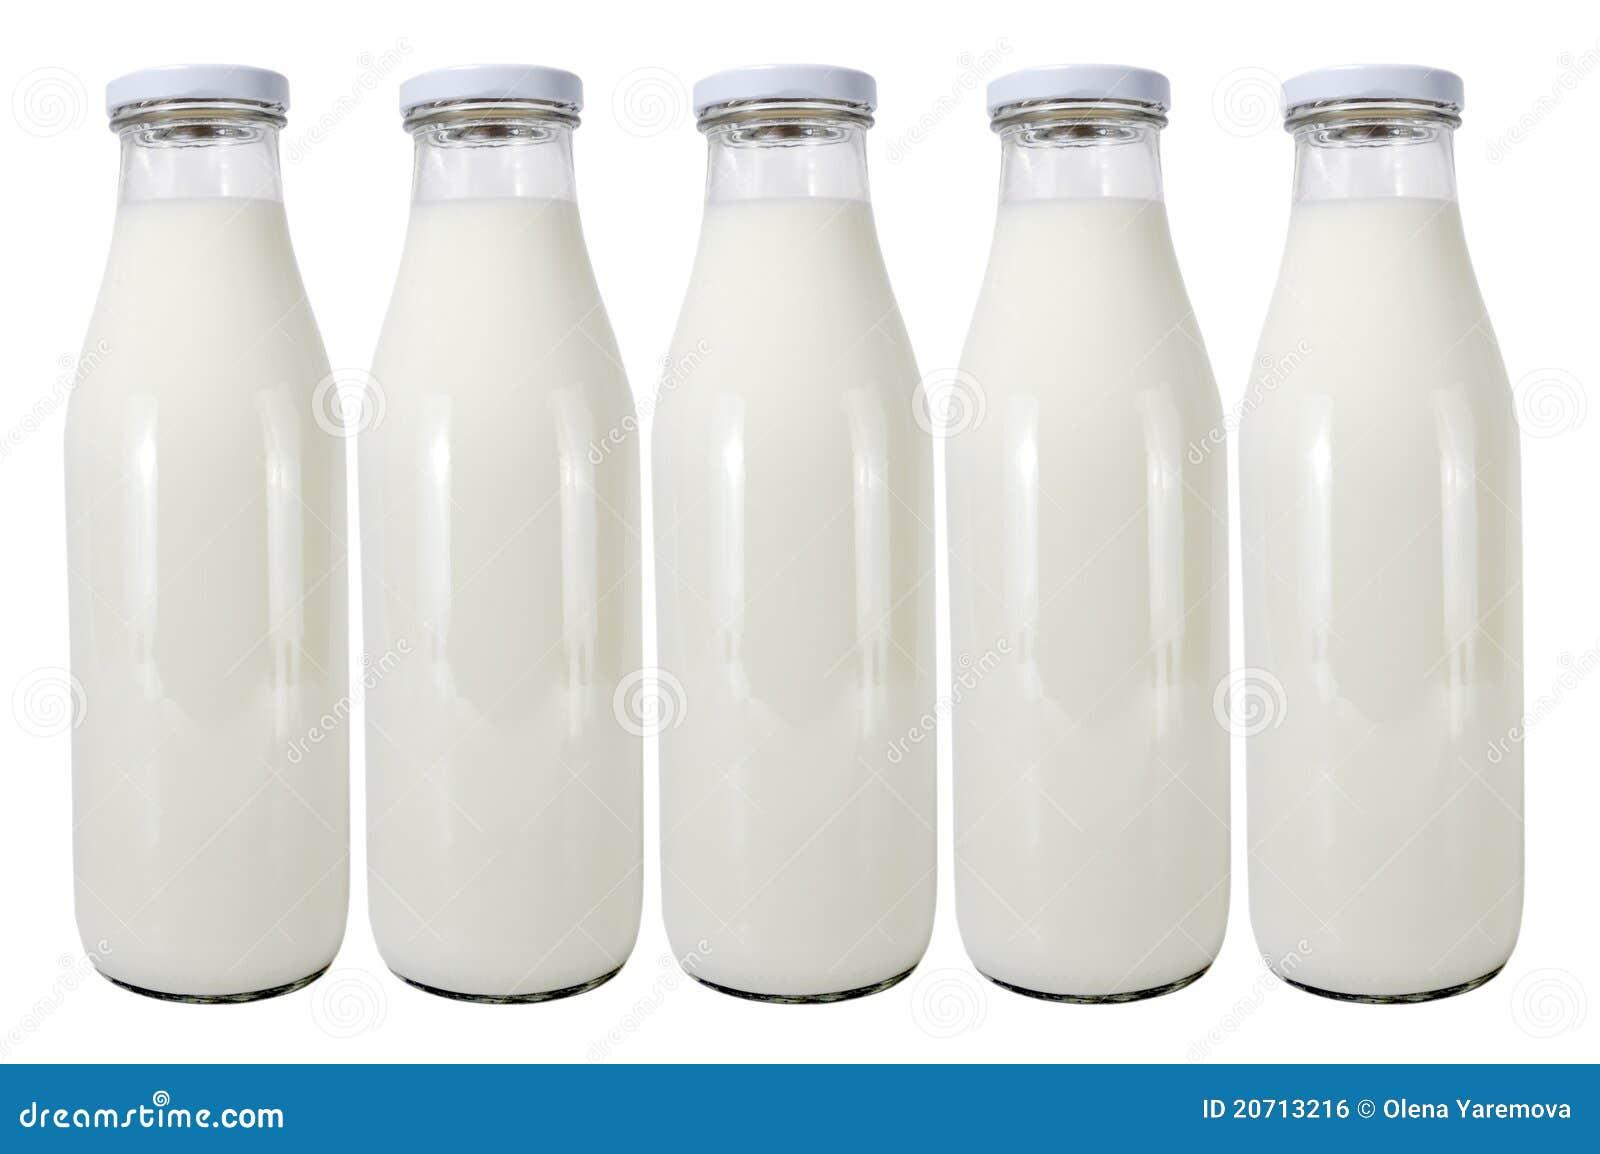 Chocolate Milk Glass Bottles